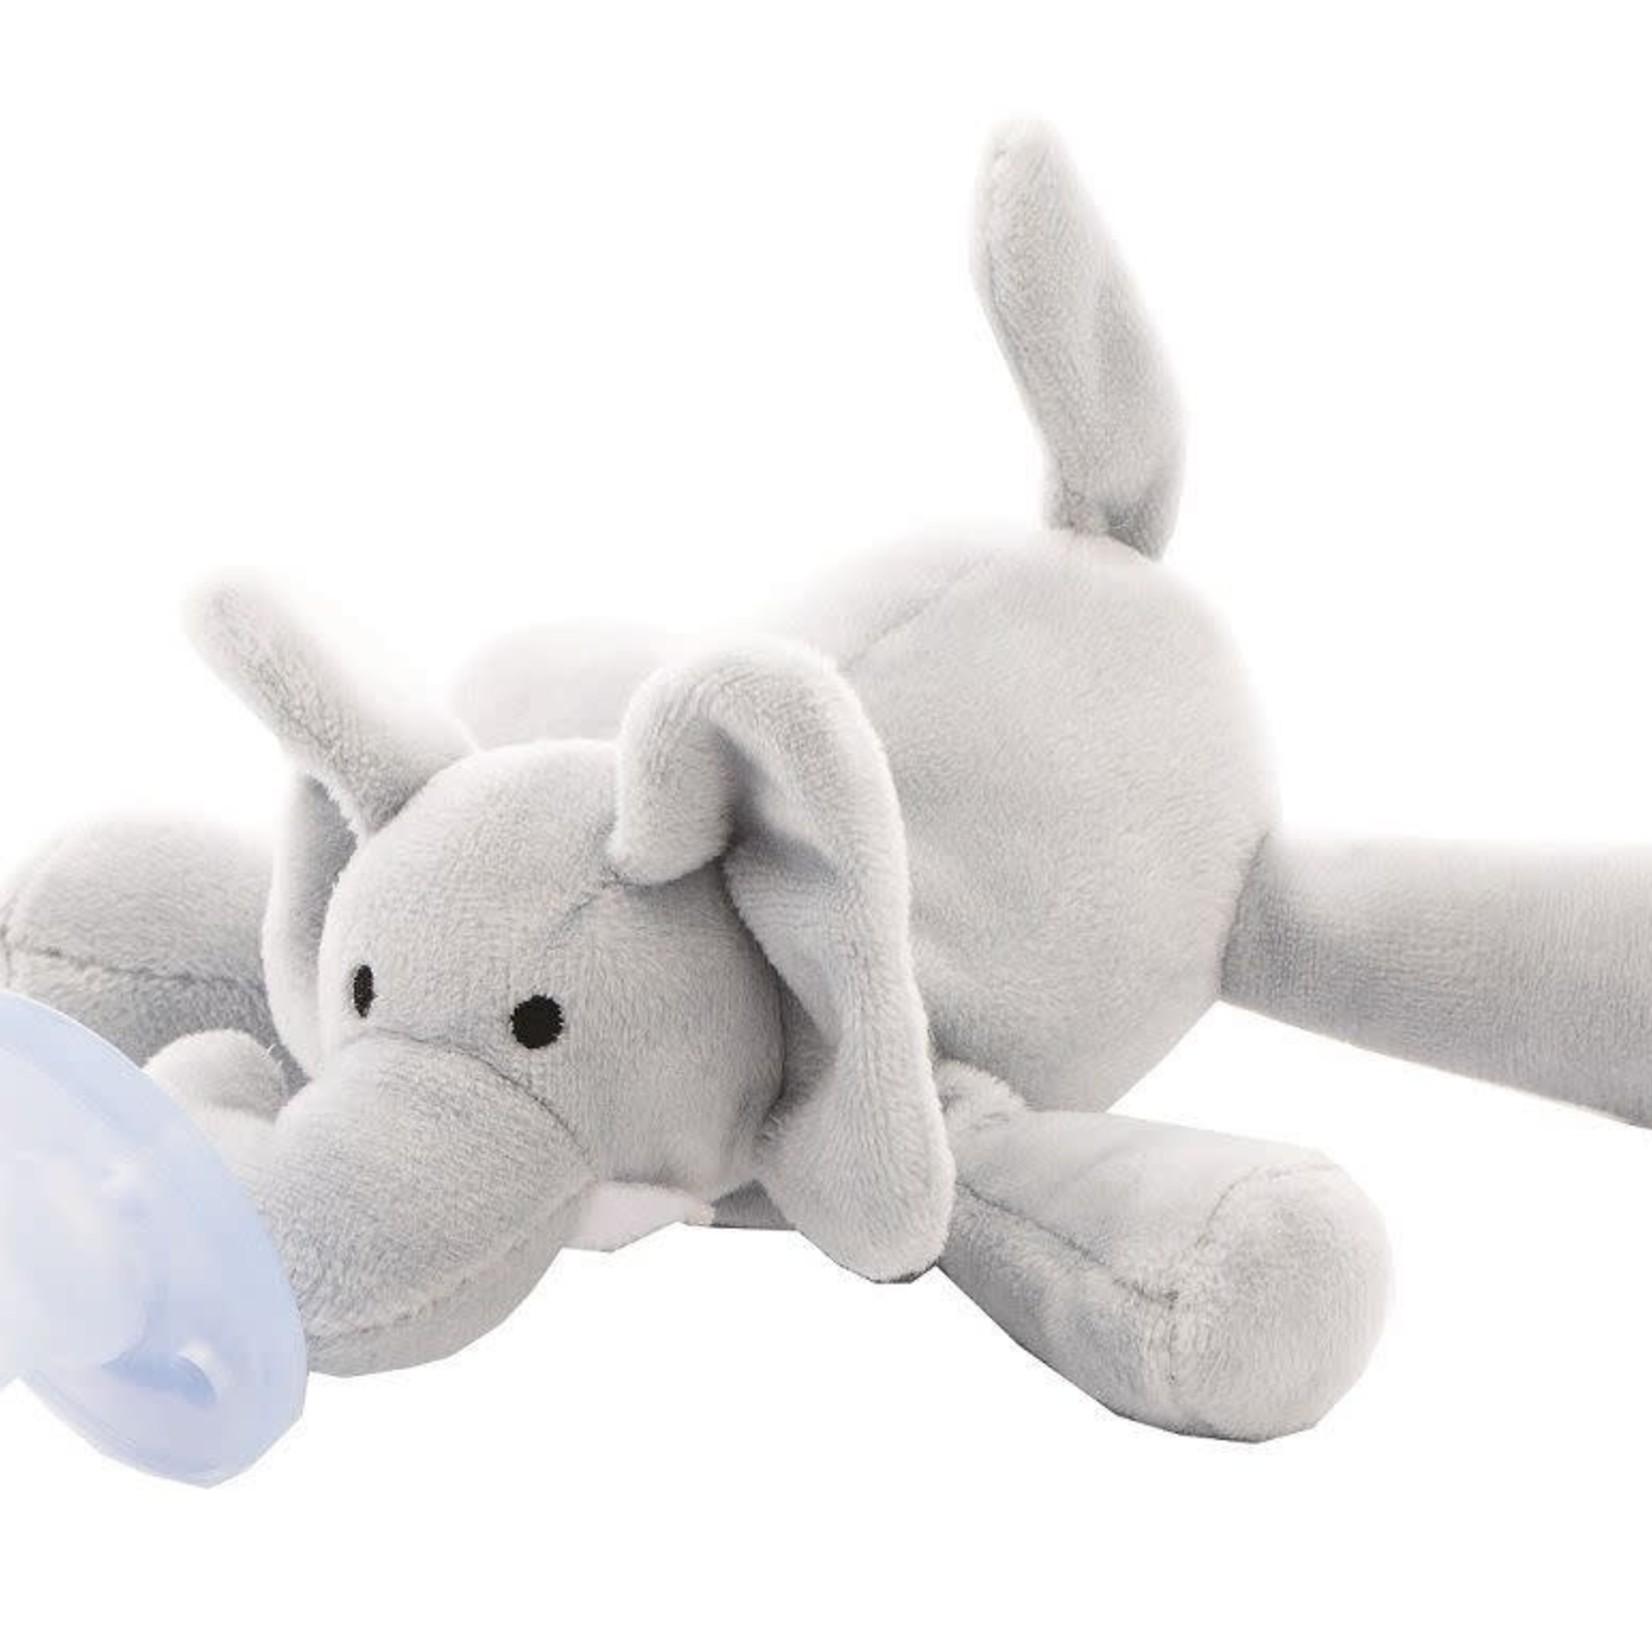 MiniKOiOi Slaapvriendje (Olifant)